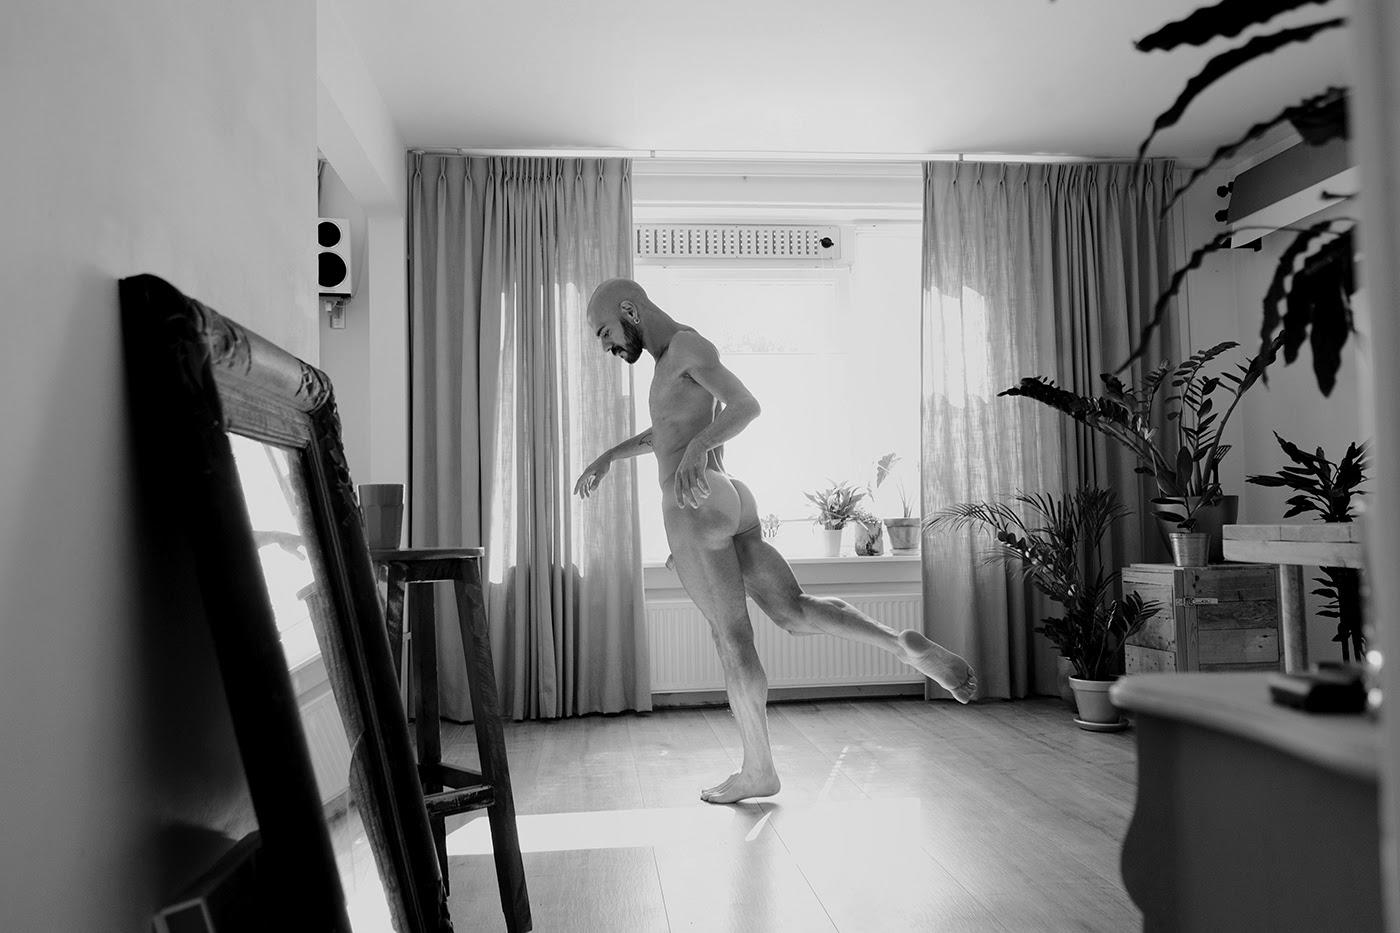 DB, by Paul Sixta ft Denis Bruno (NSFW)